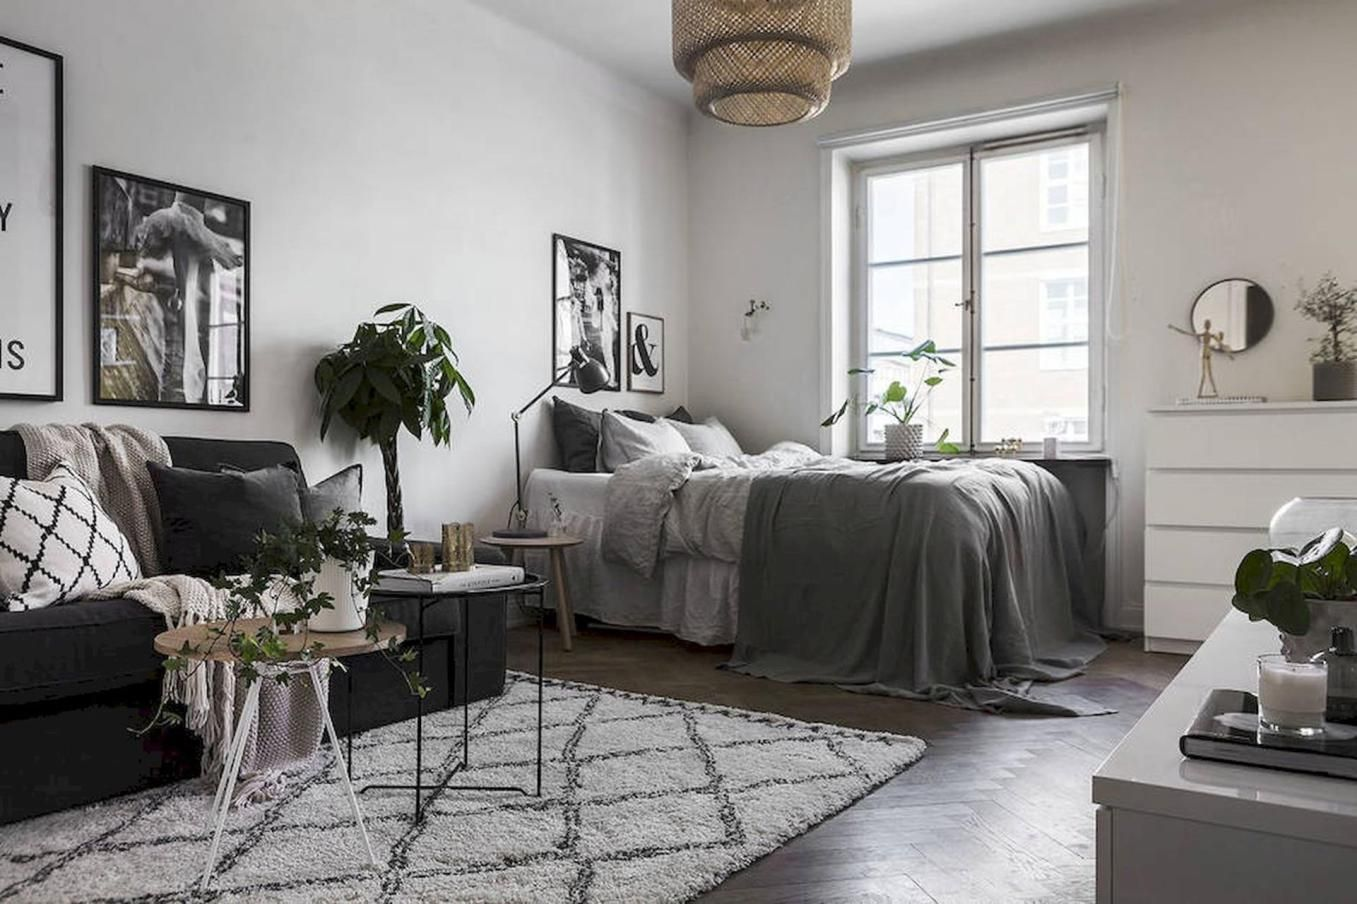 51 Cozy Studio Apartment Decorating On A Budget Ideas